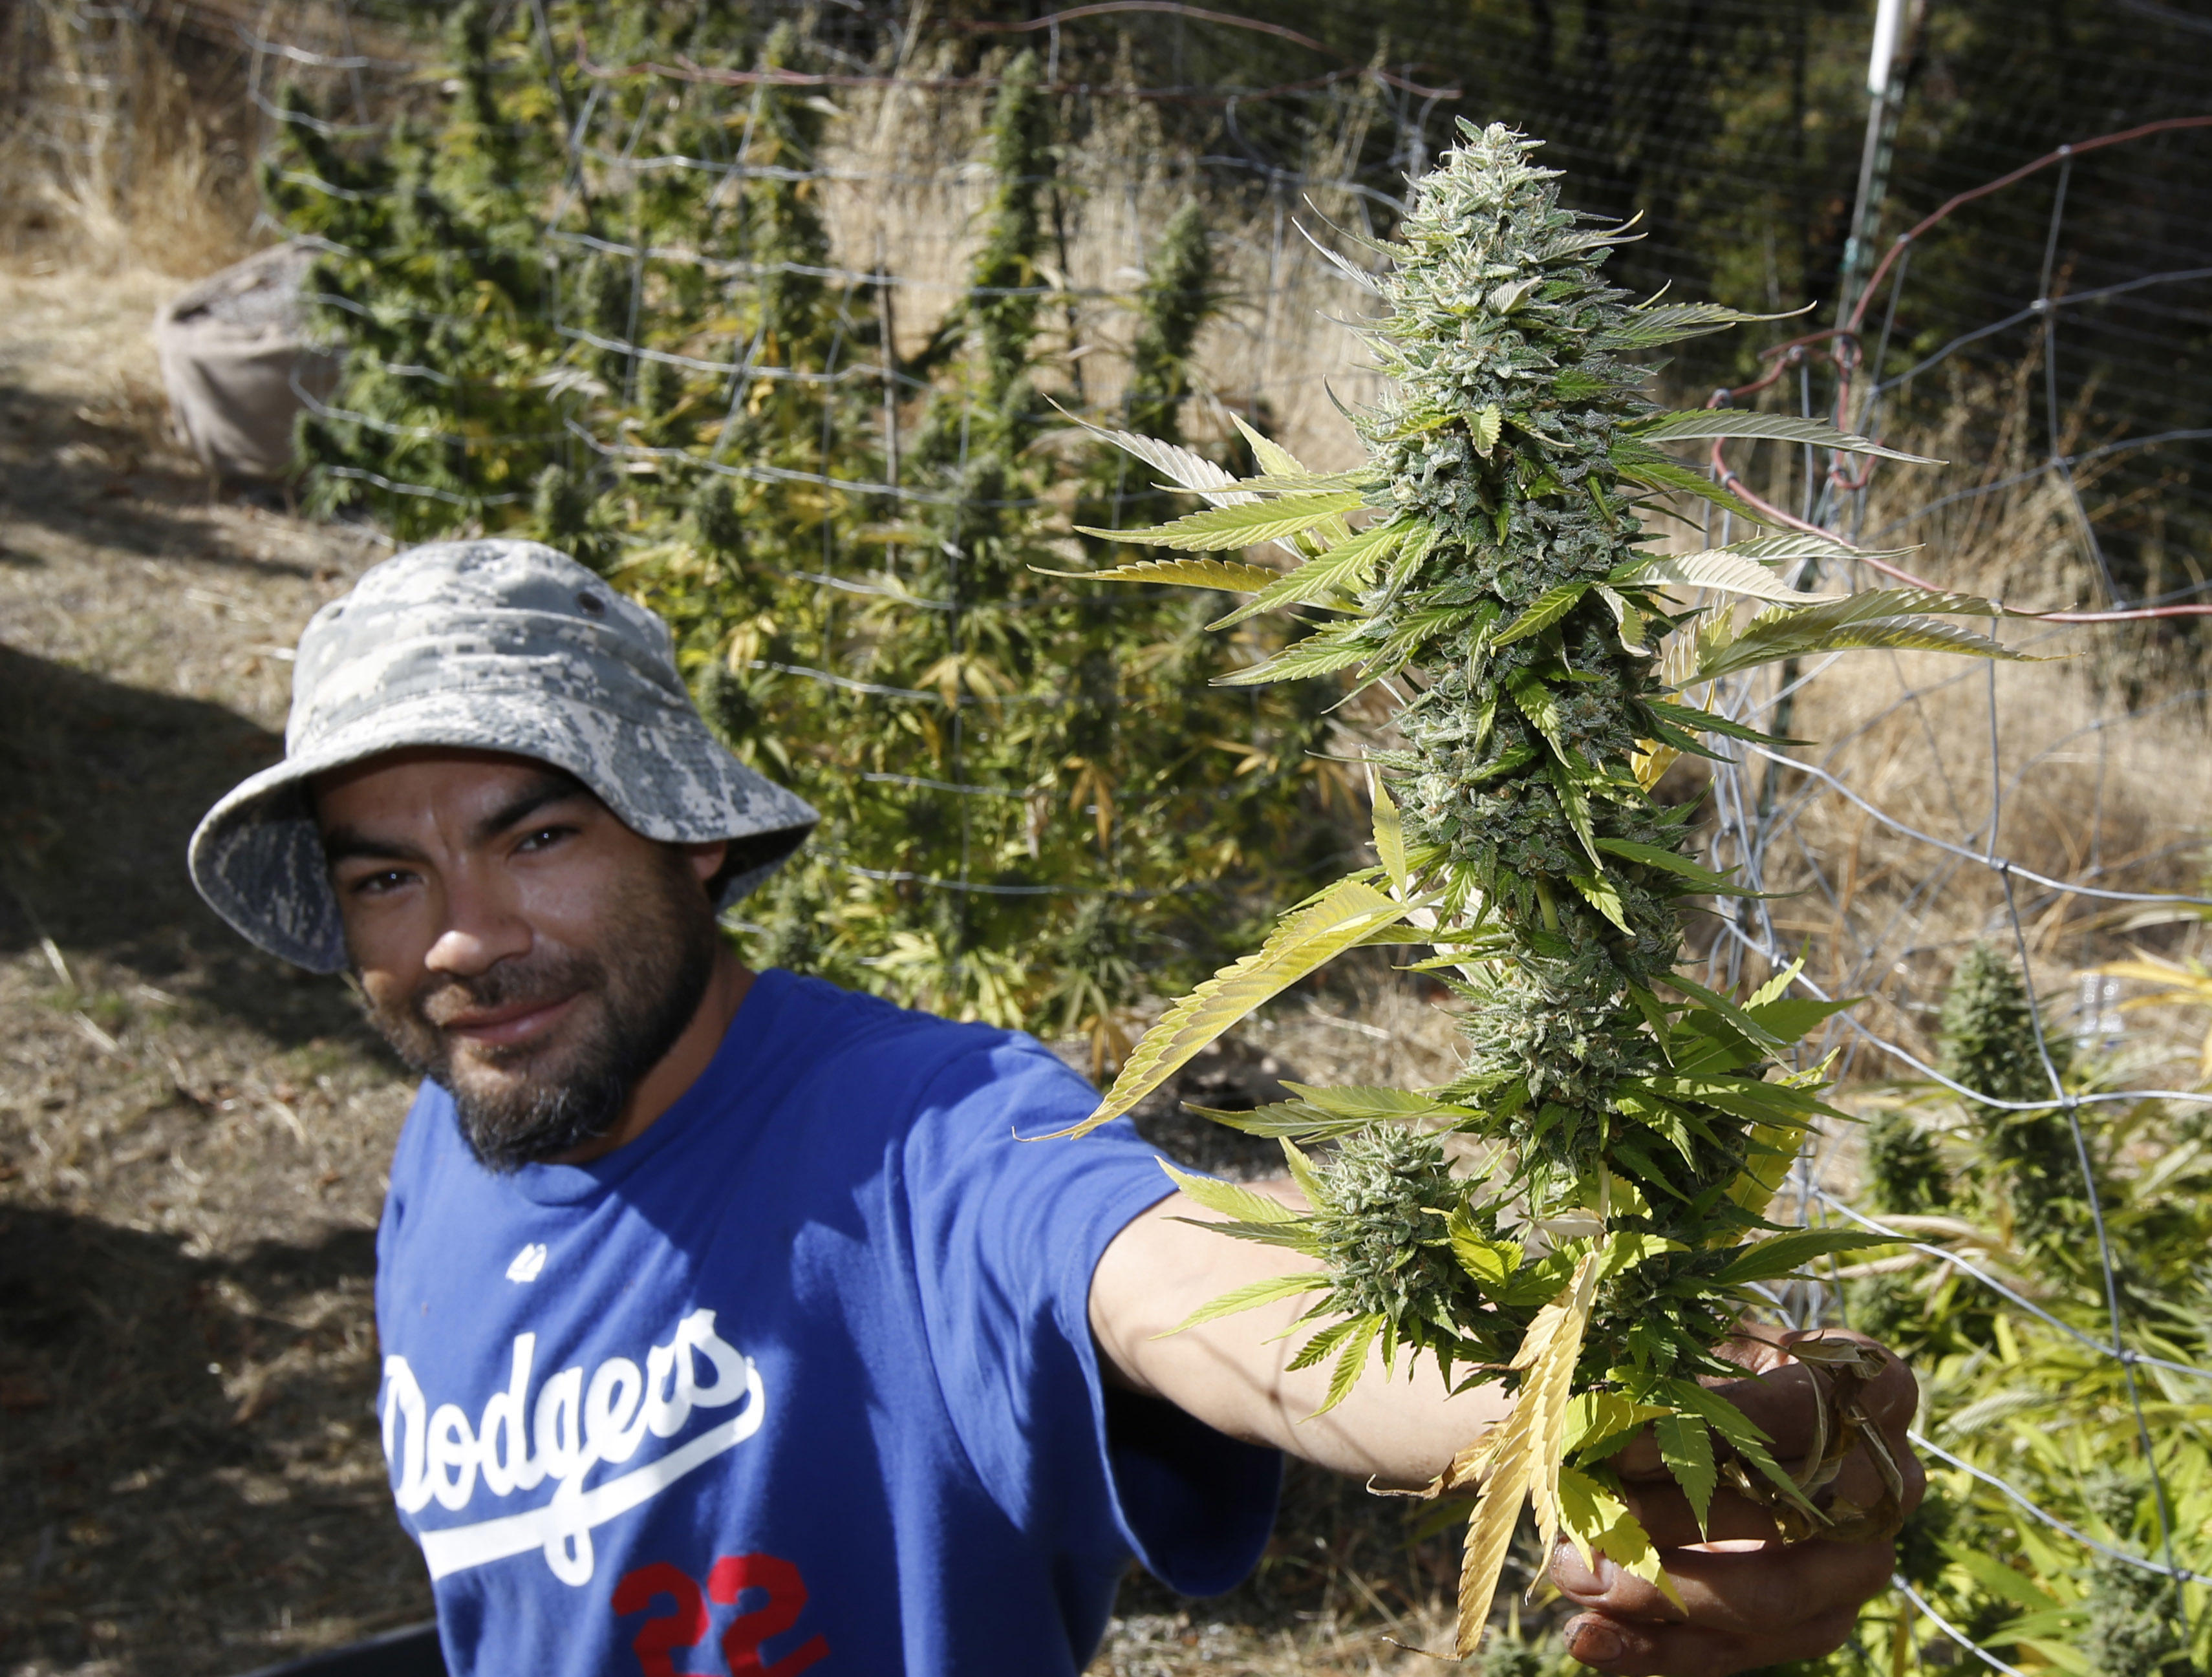 Not all California marijuana farmers want pot legalized - CBS News d5fb58506cec